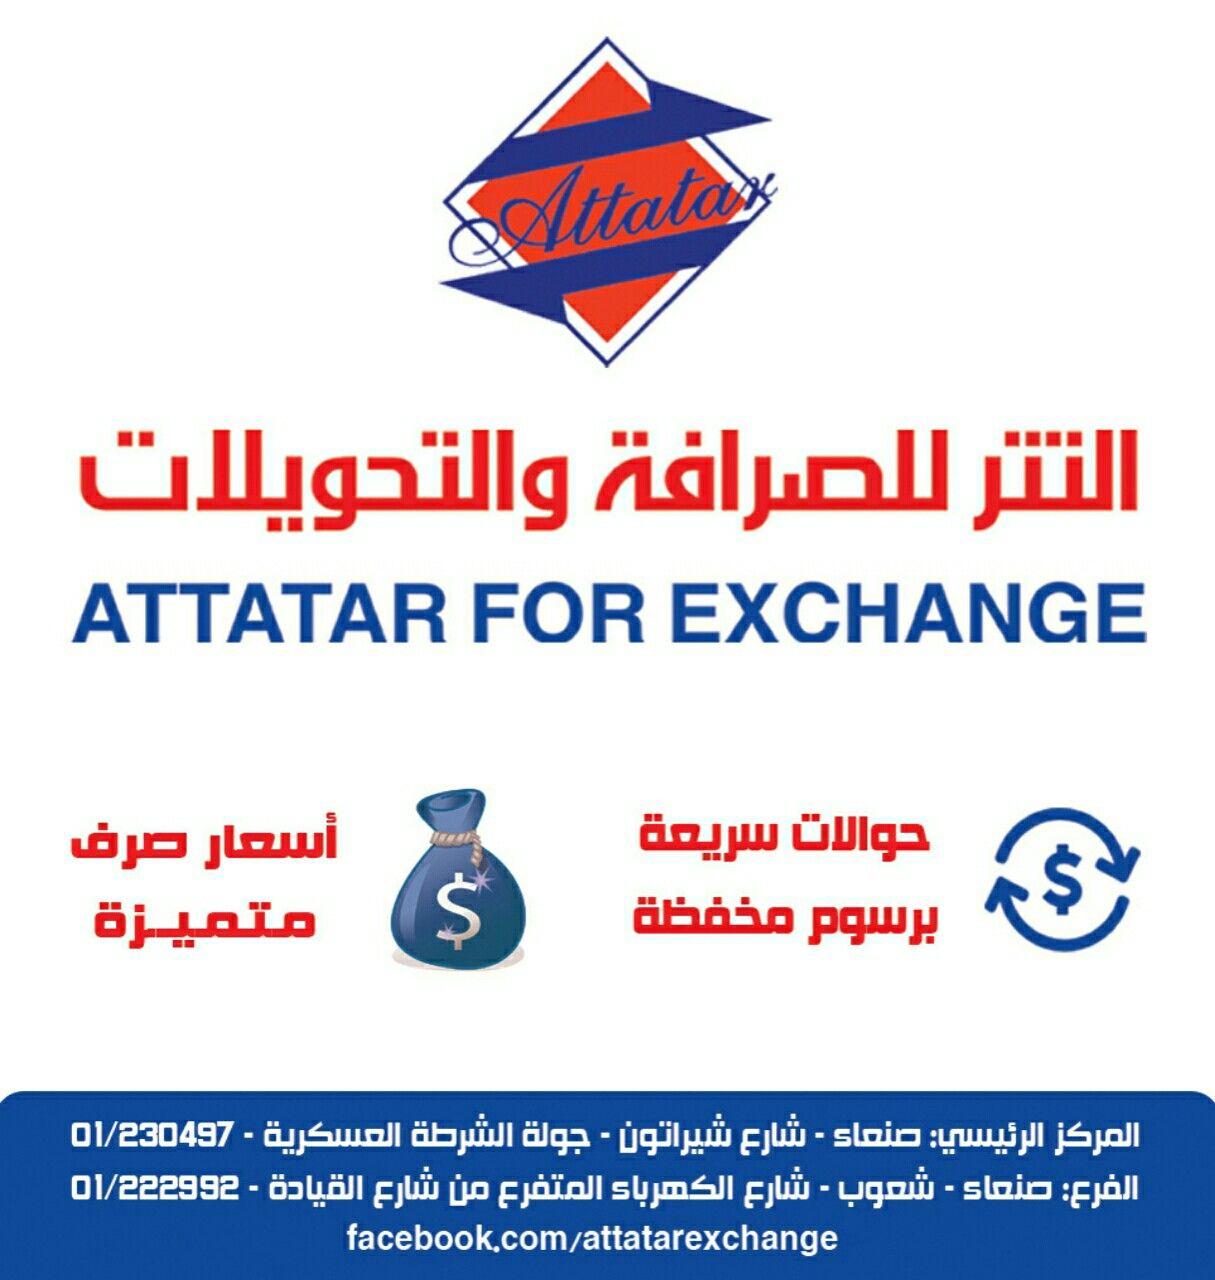 Attatar For Exchange Bags Design Design Indesign My Design